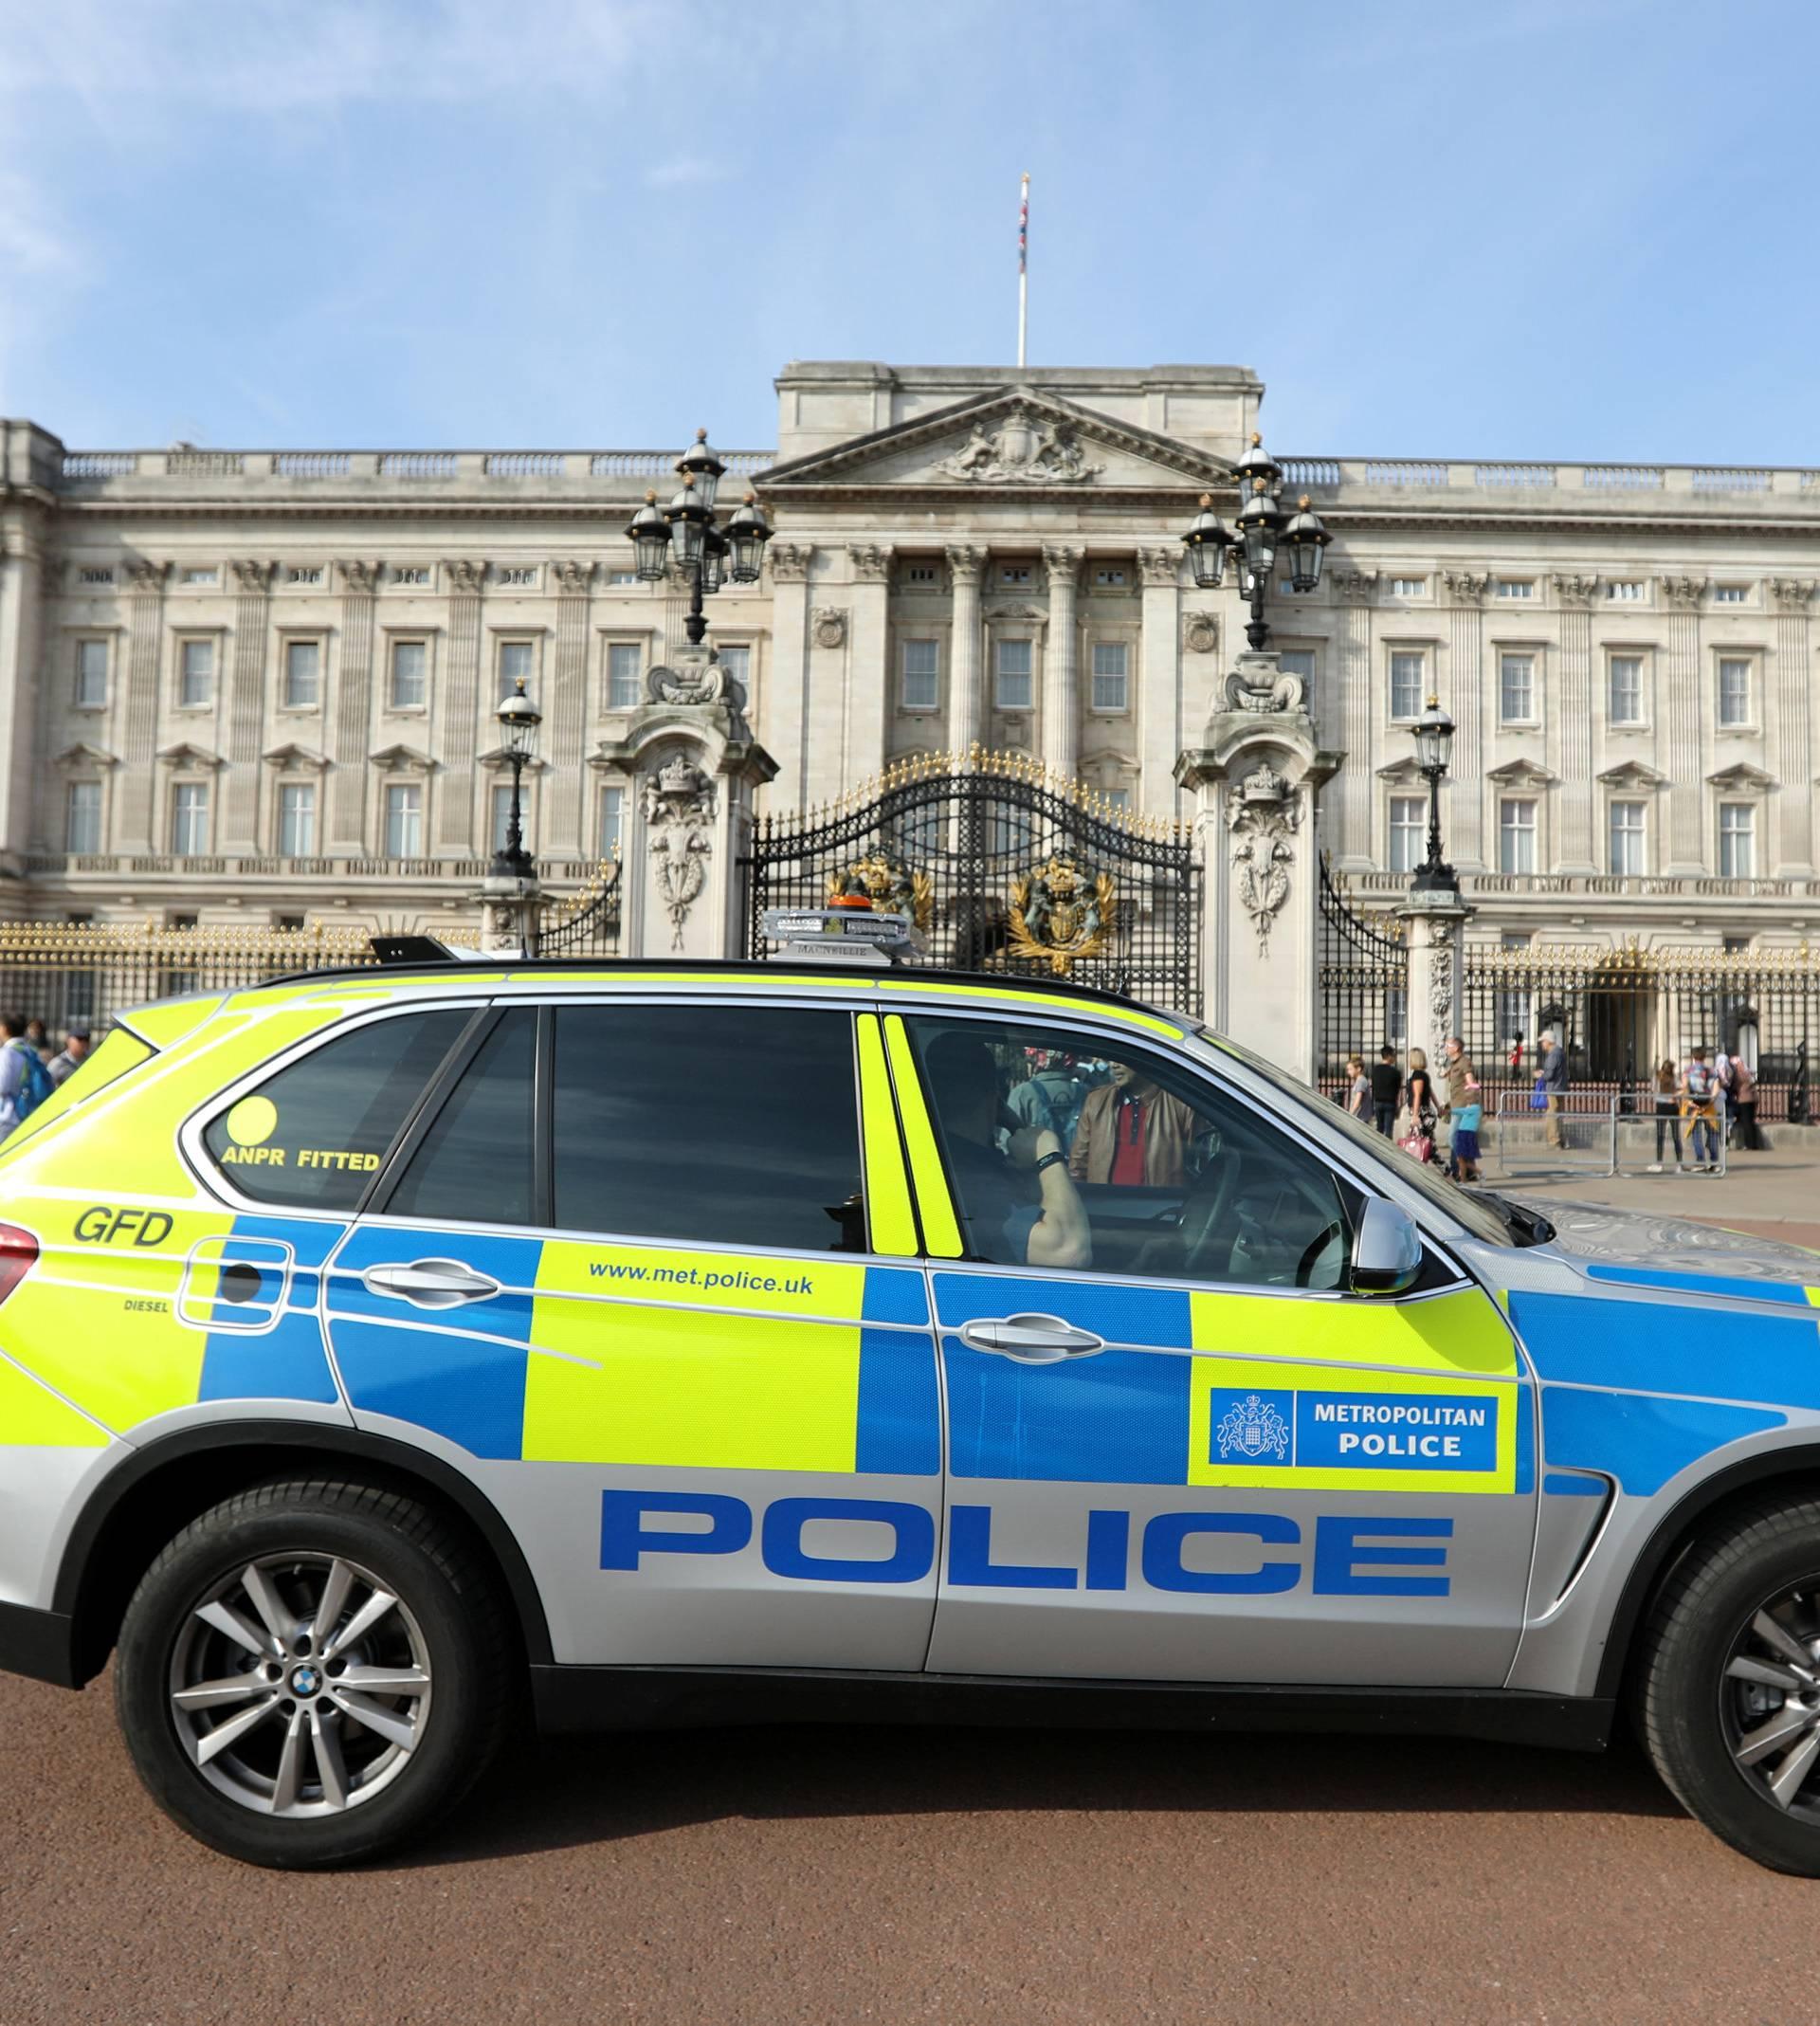 A police vehicle patrols outside Buckingham Palace in London